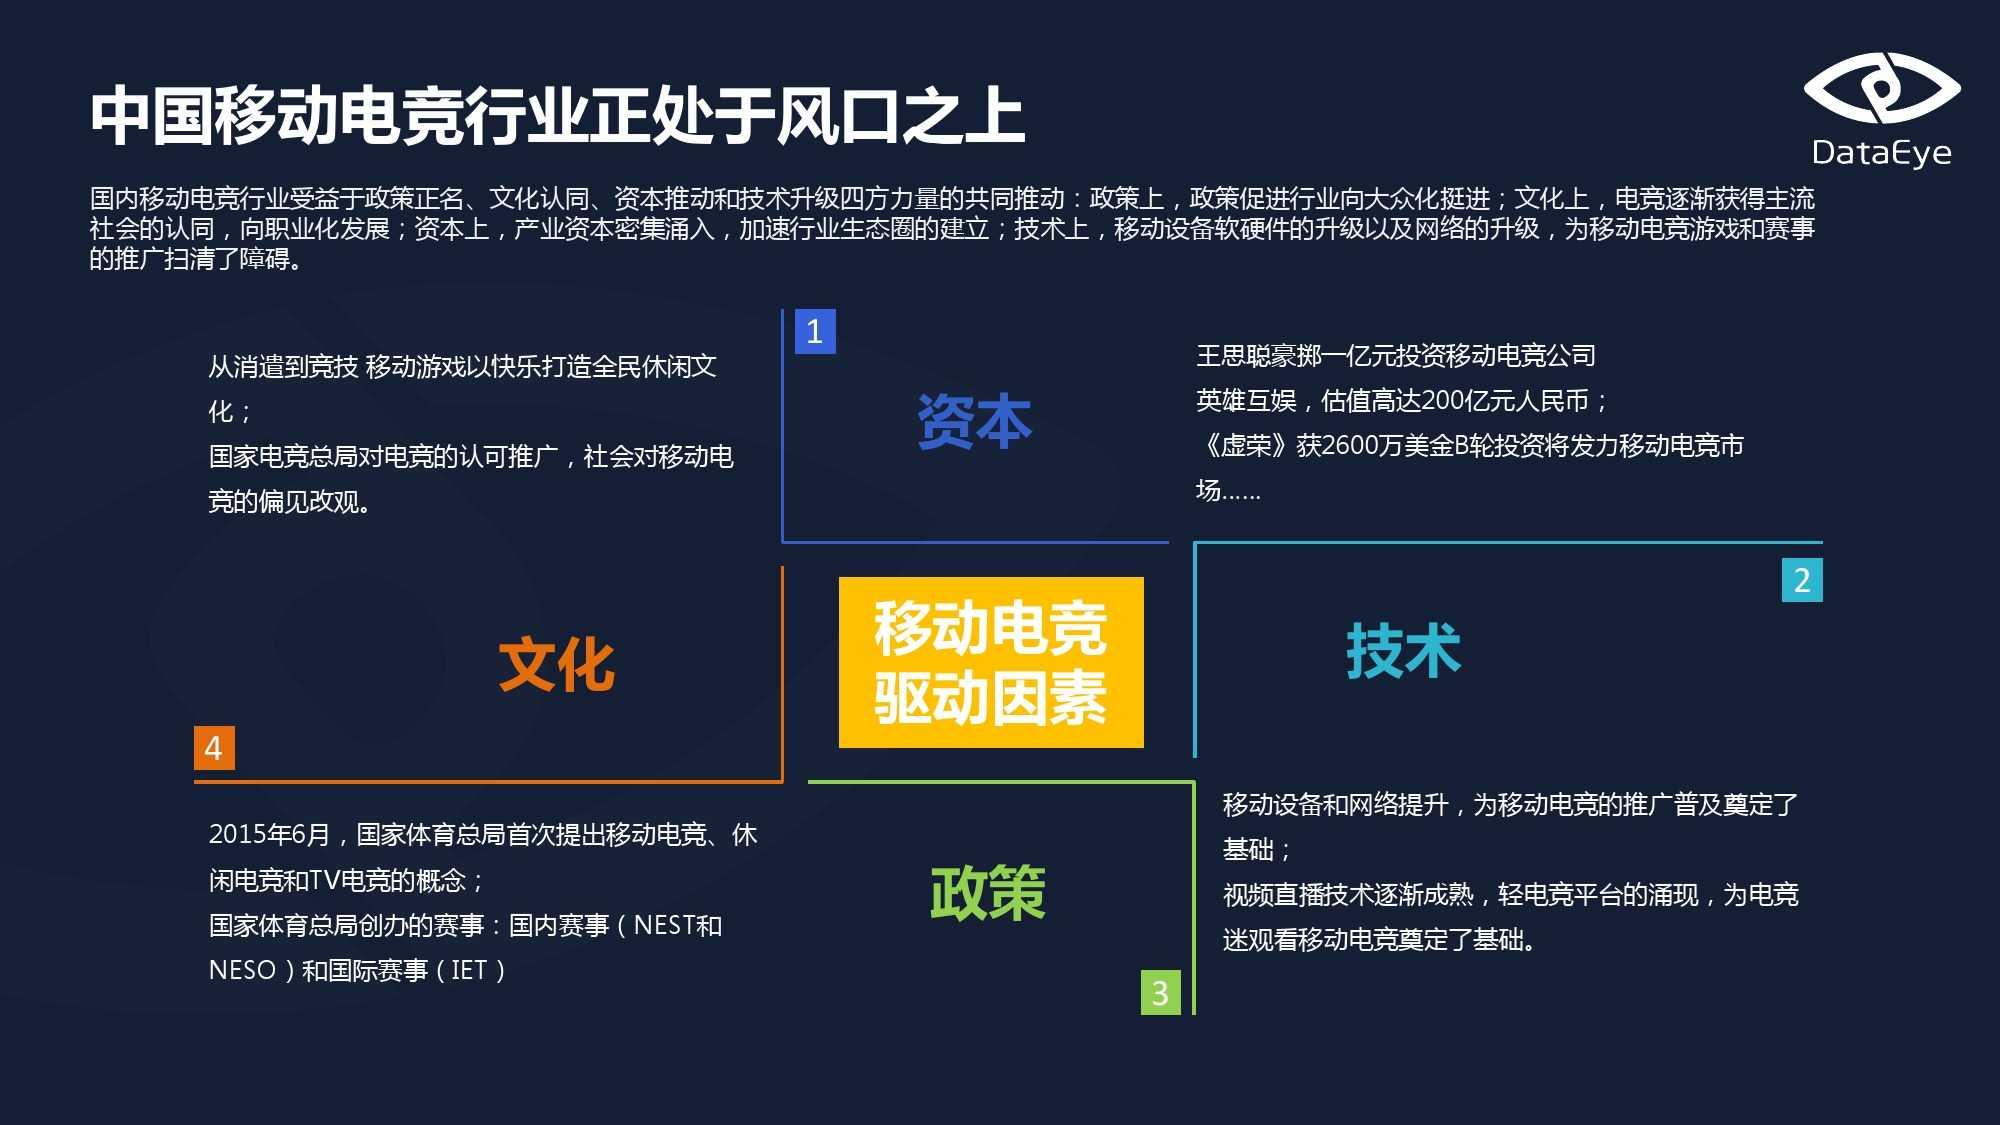 Dataeys:移动电竞专题报告(上)_000009